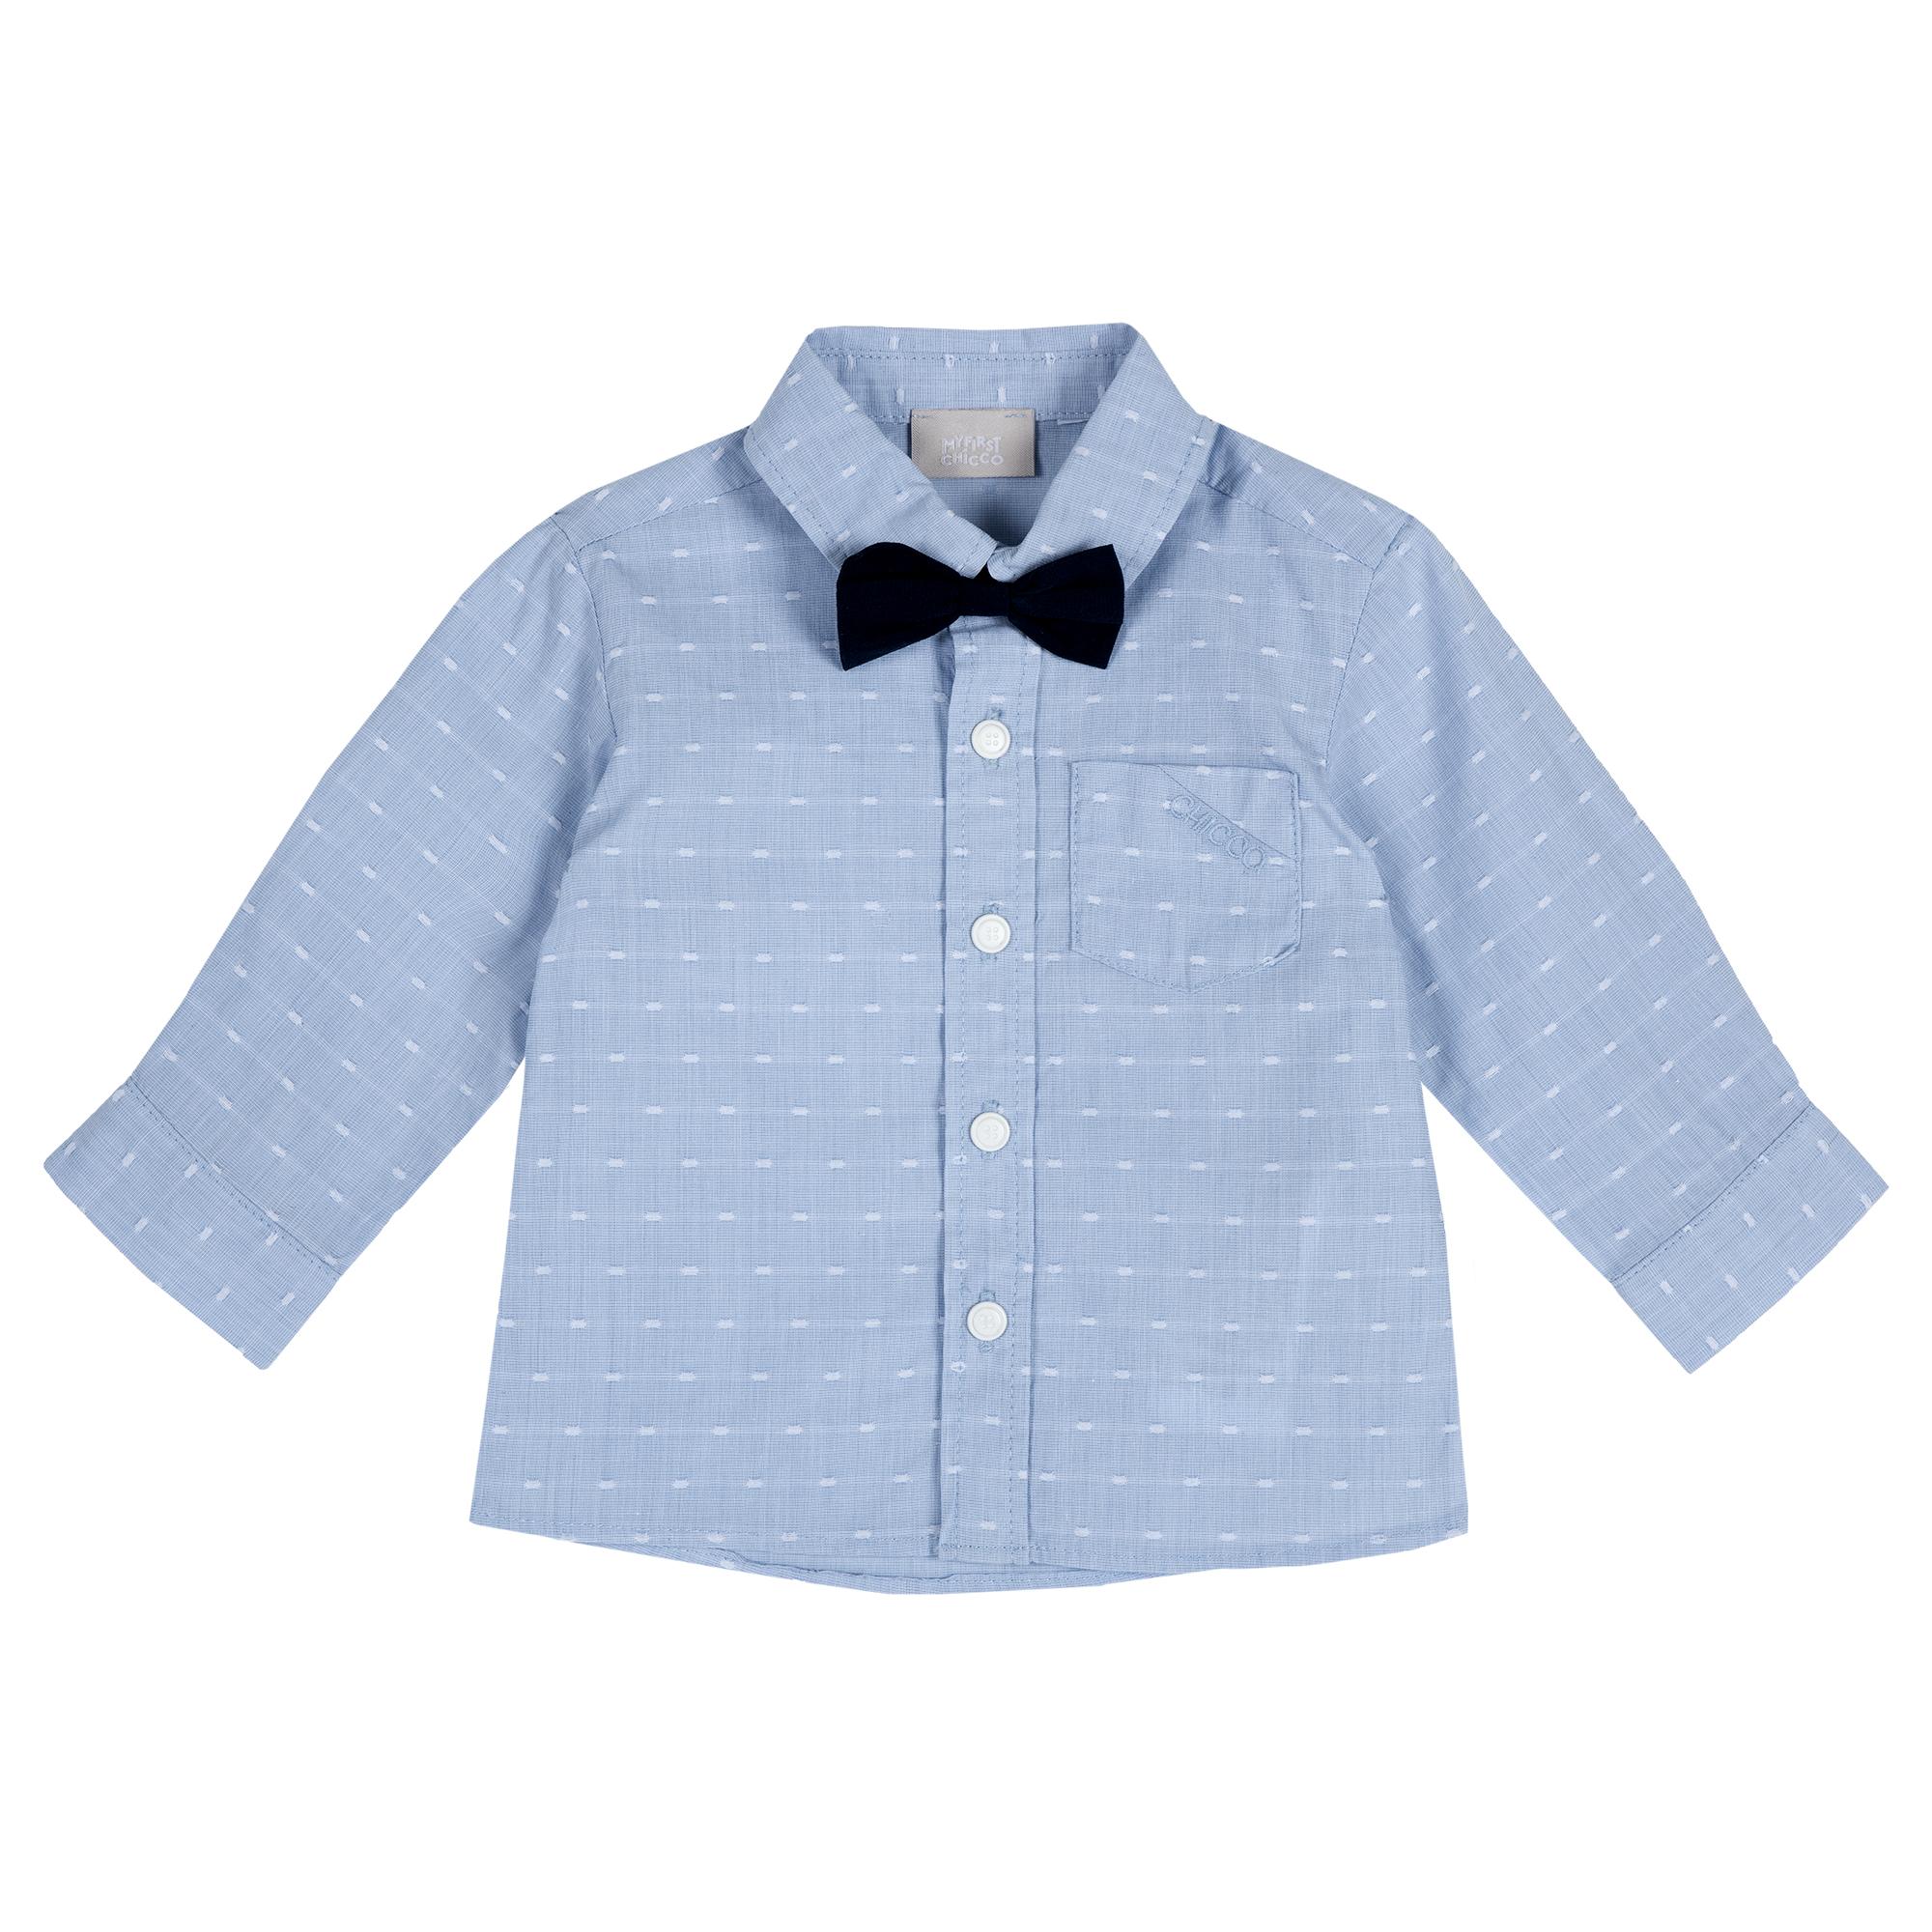 Camasa Copii Chicco, Papilon, Albastru, 54520 imagine